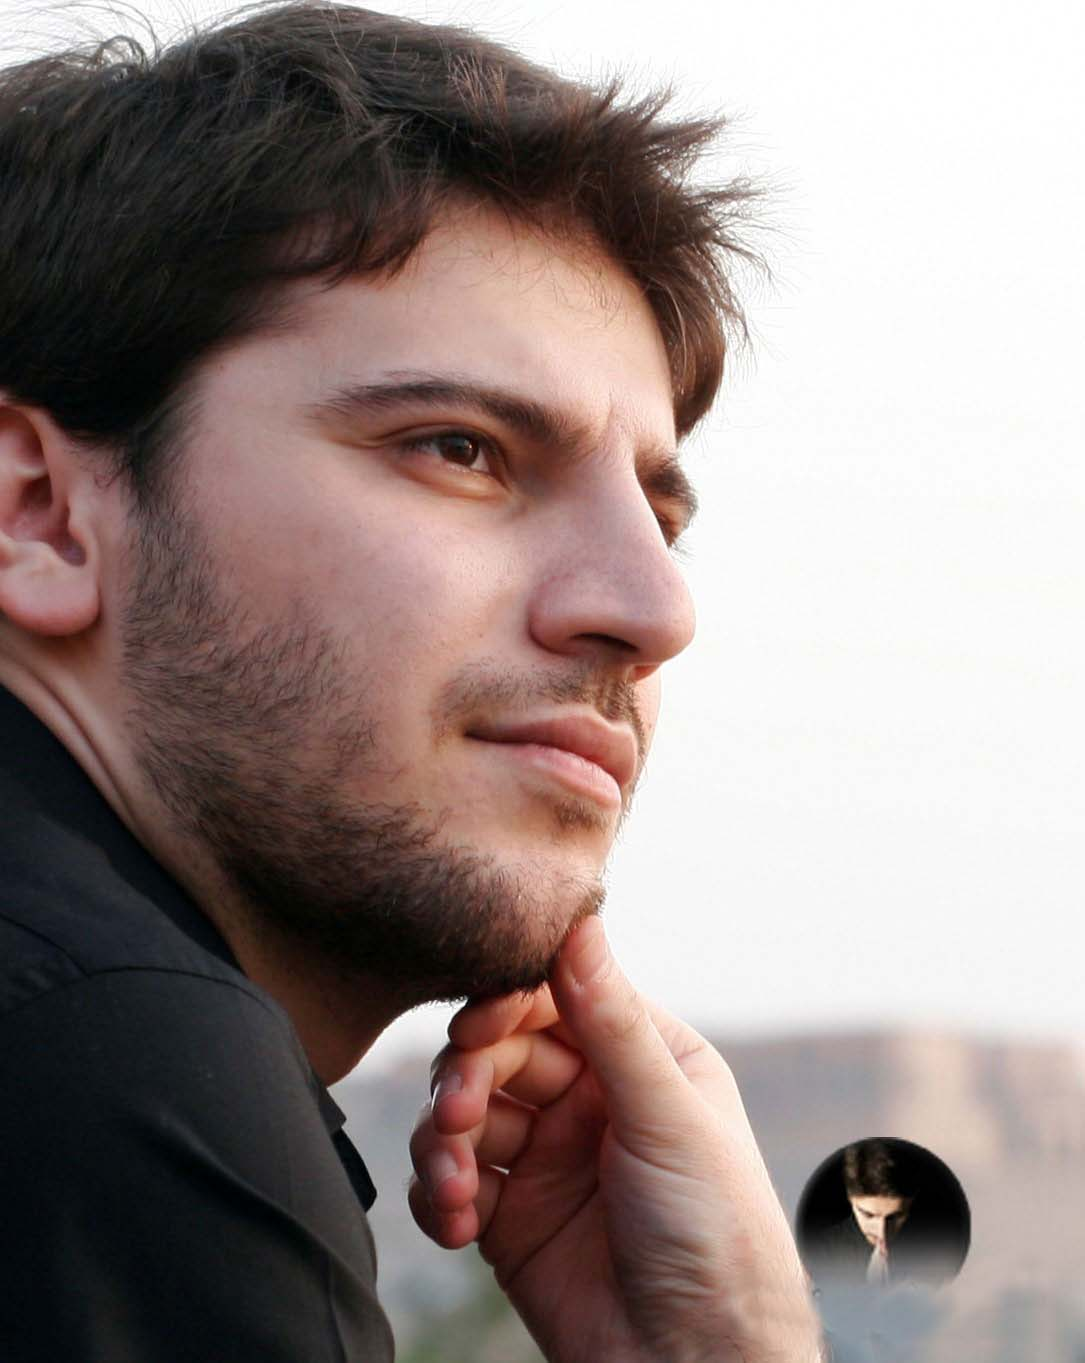 http://iraniangulf.persiangig.com/image/01.jpg